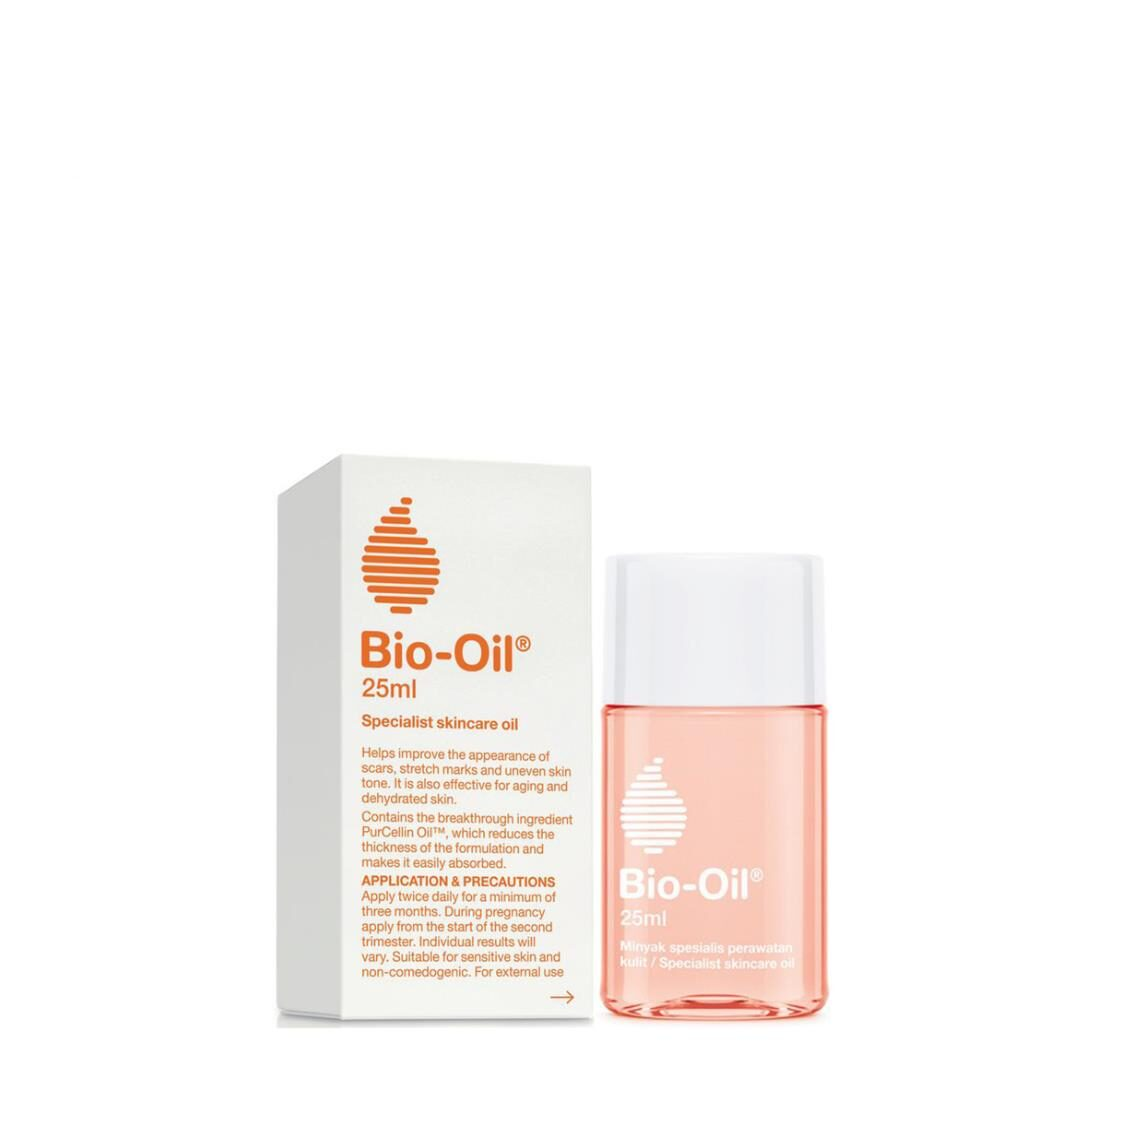 Bio-Oil 25ml